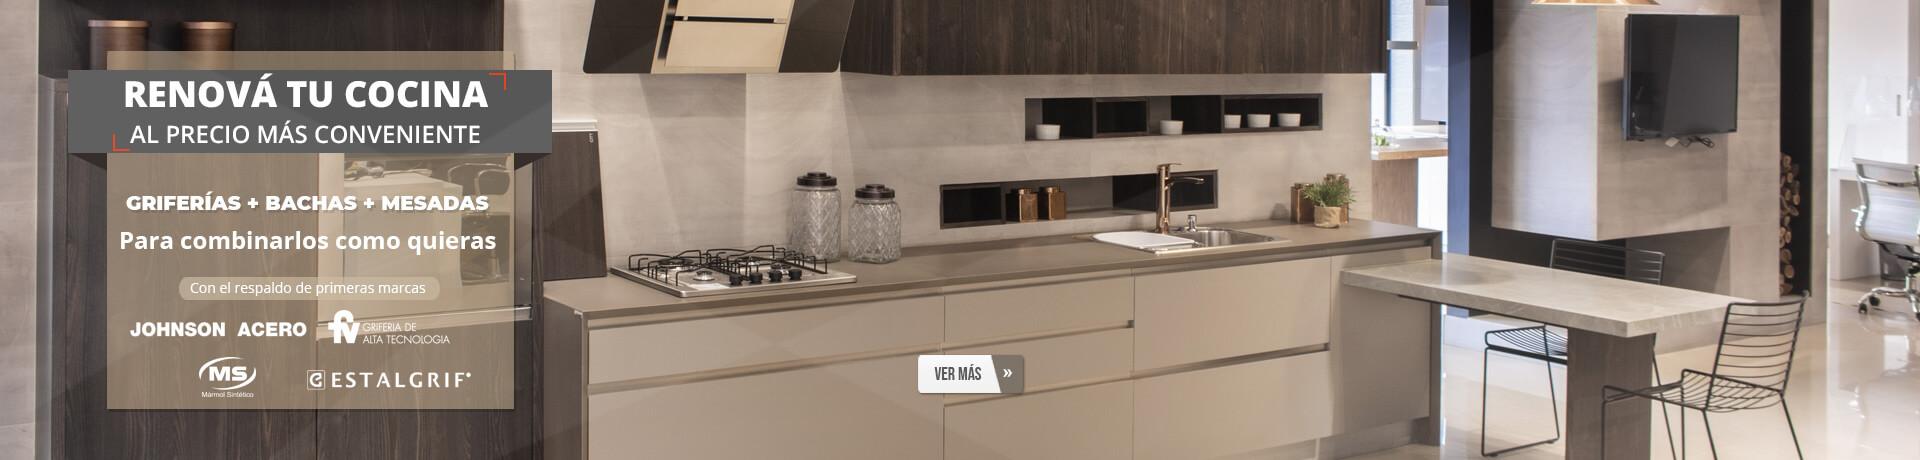 renova-cocina-desktop